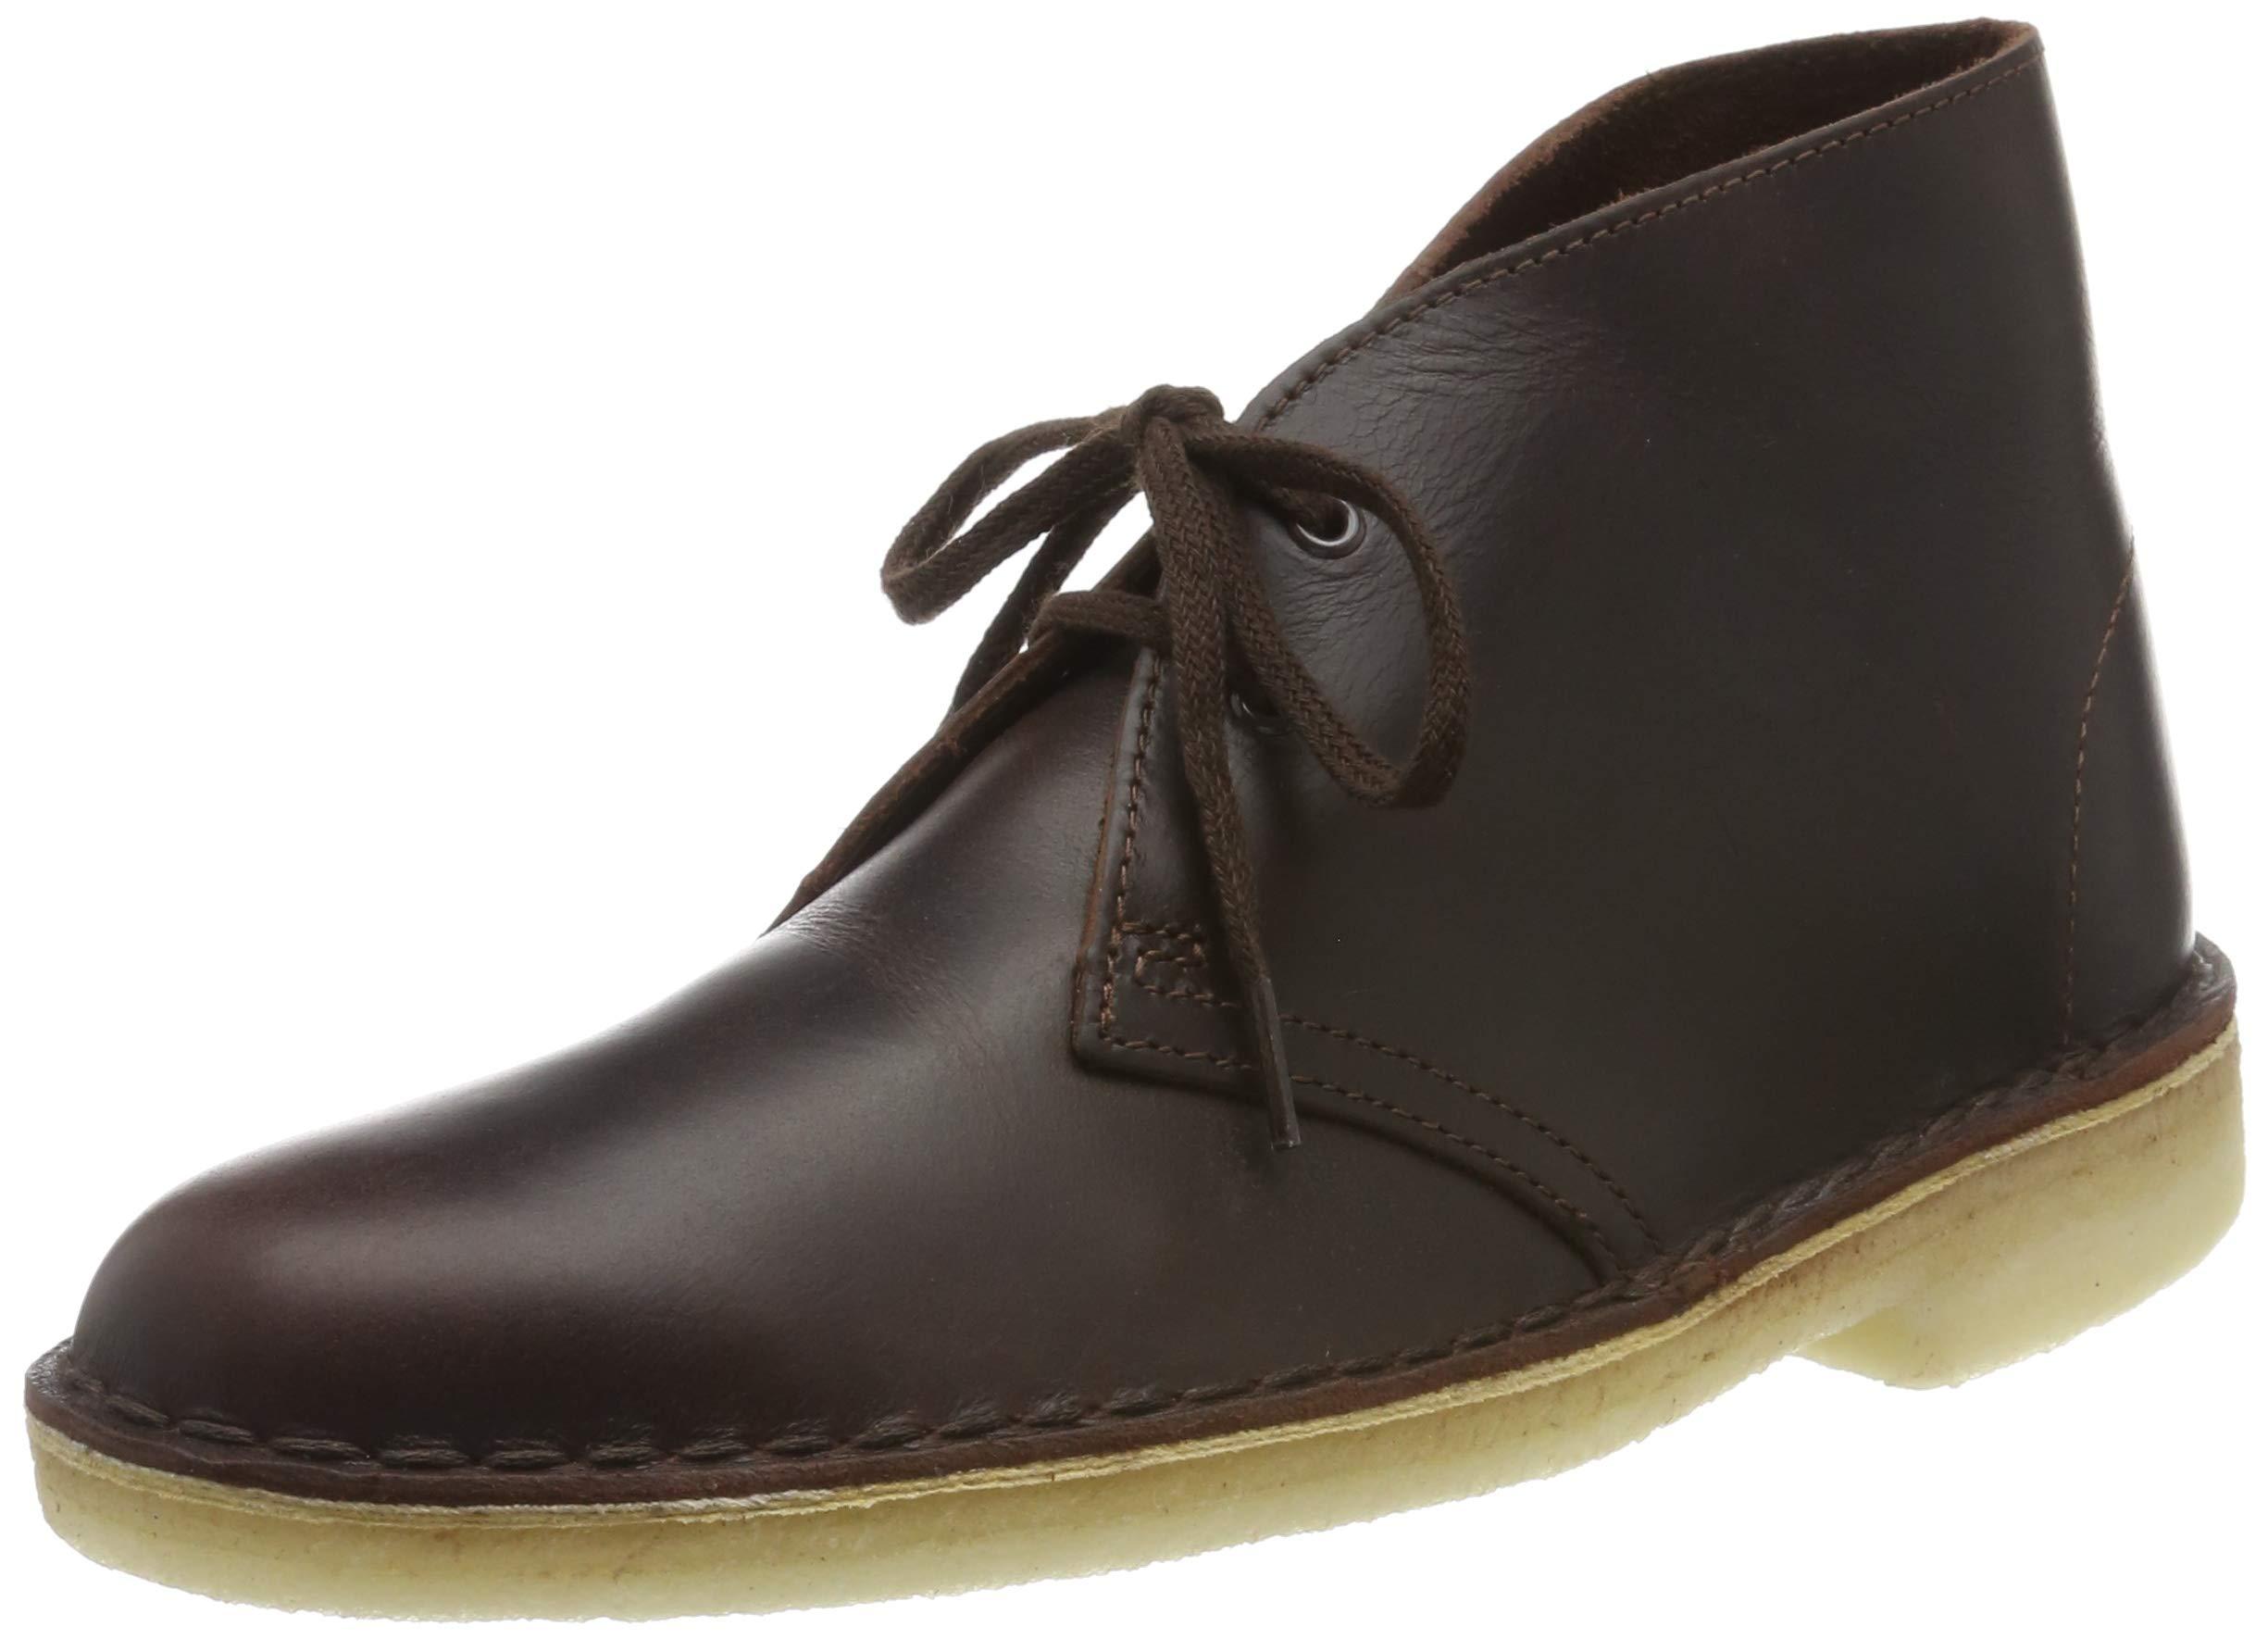 Leather39 Clarks Chestnut BootFemmeMarron Desert Eu KcJl3TF1